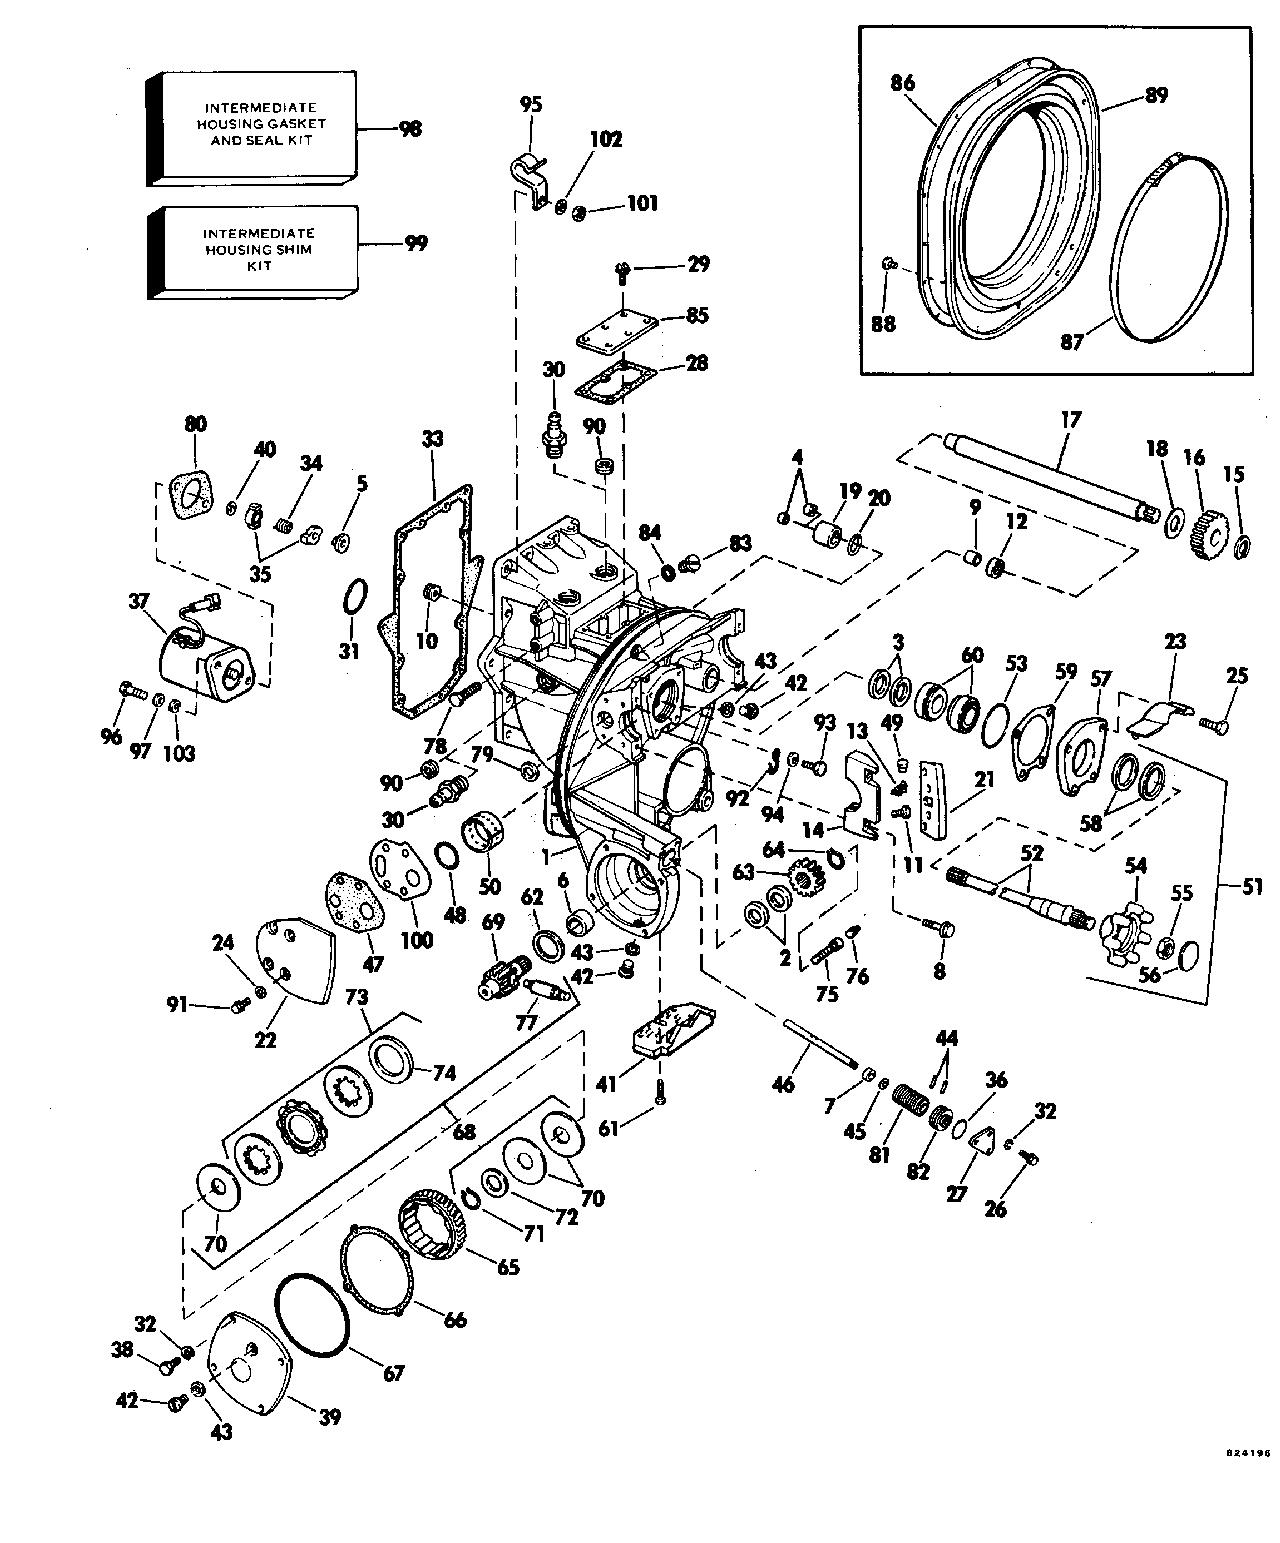 omc sterndrive parts diagram